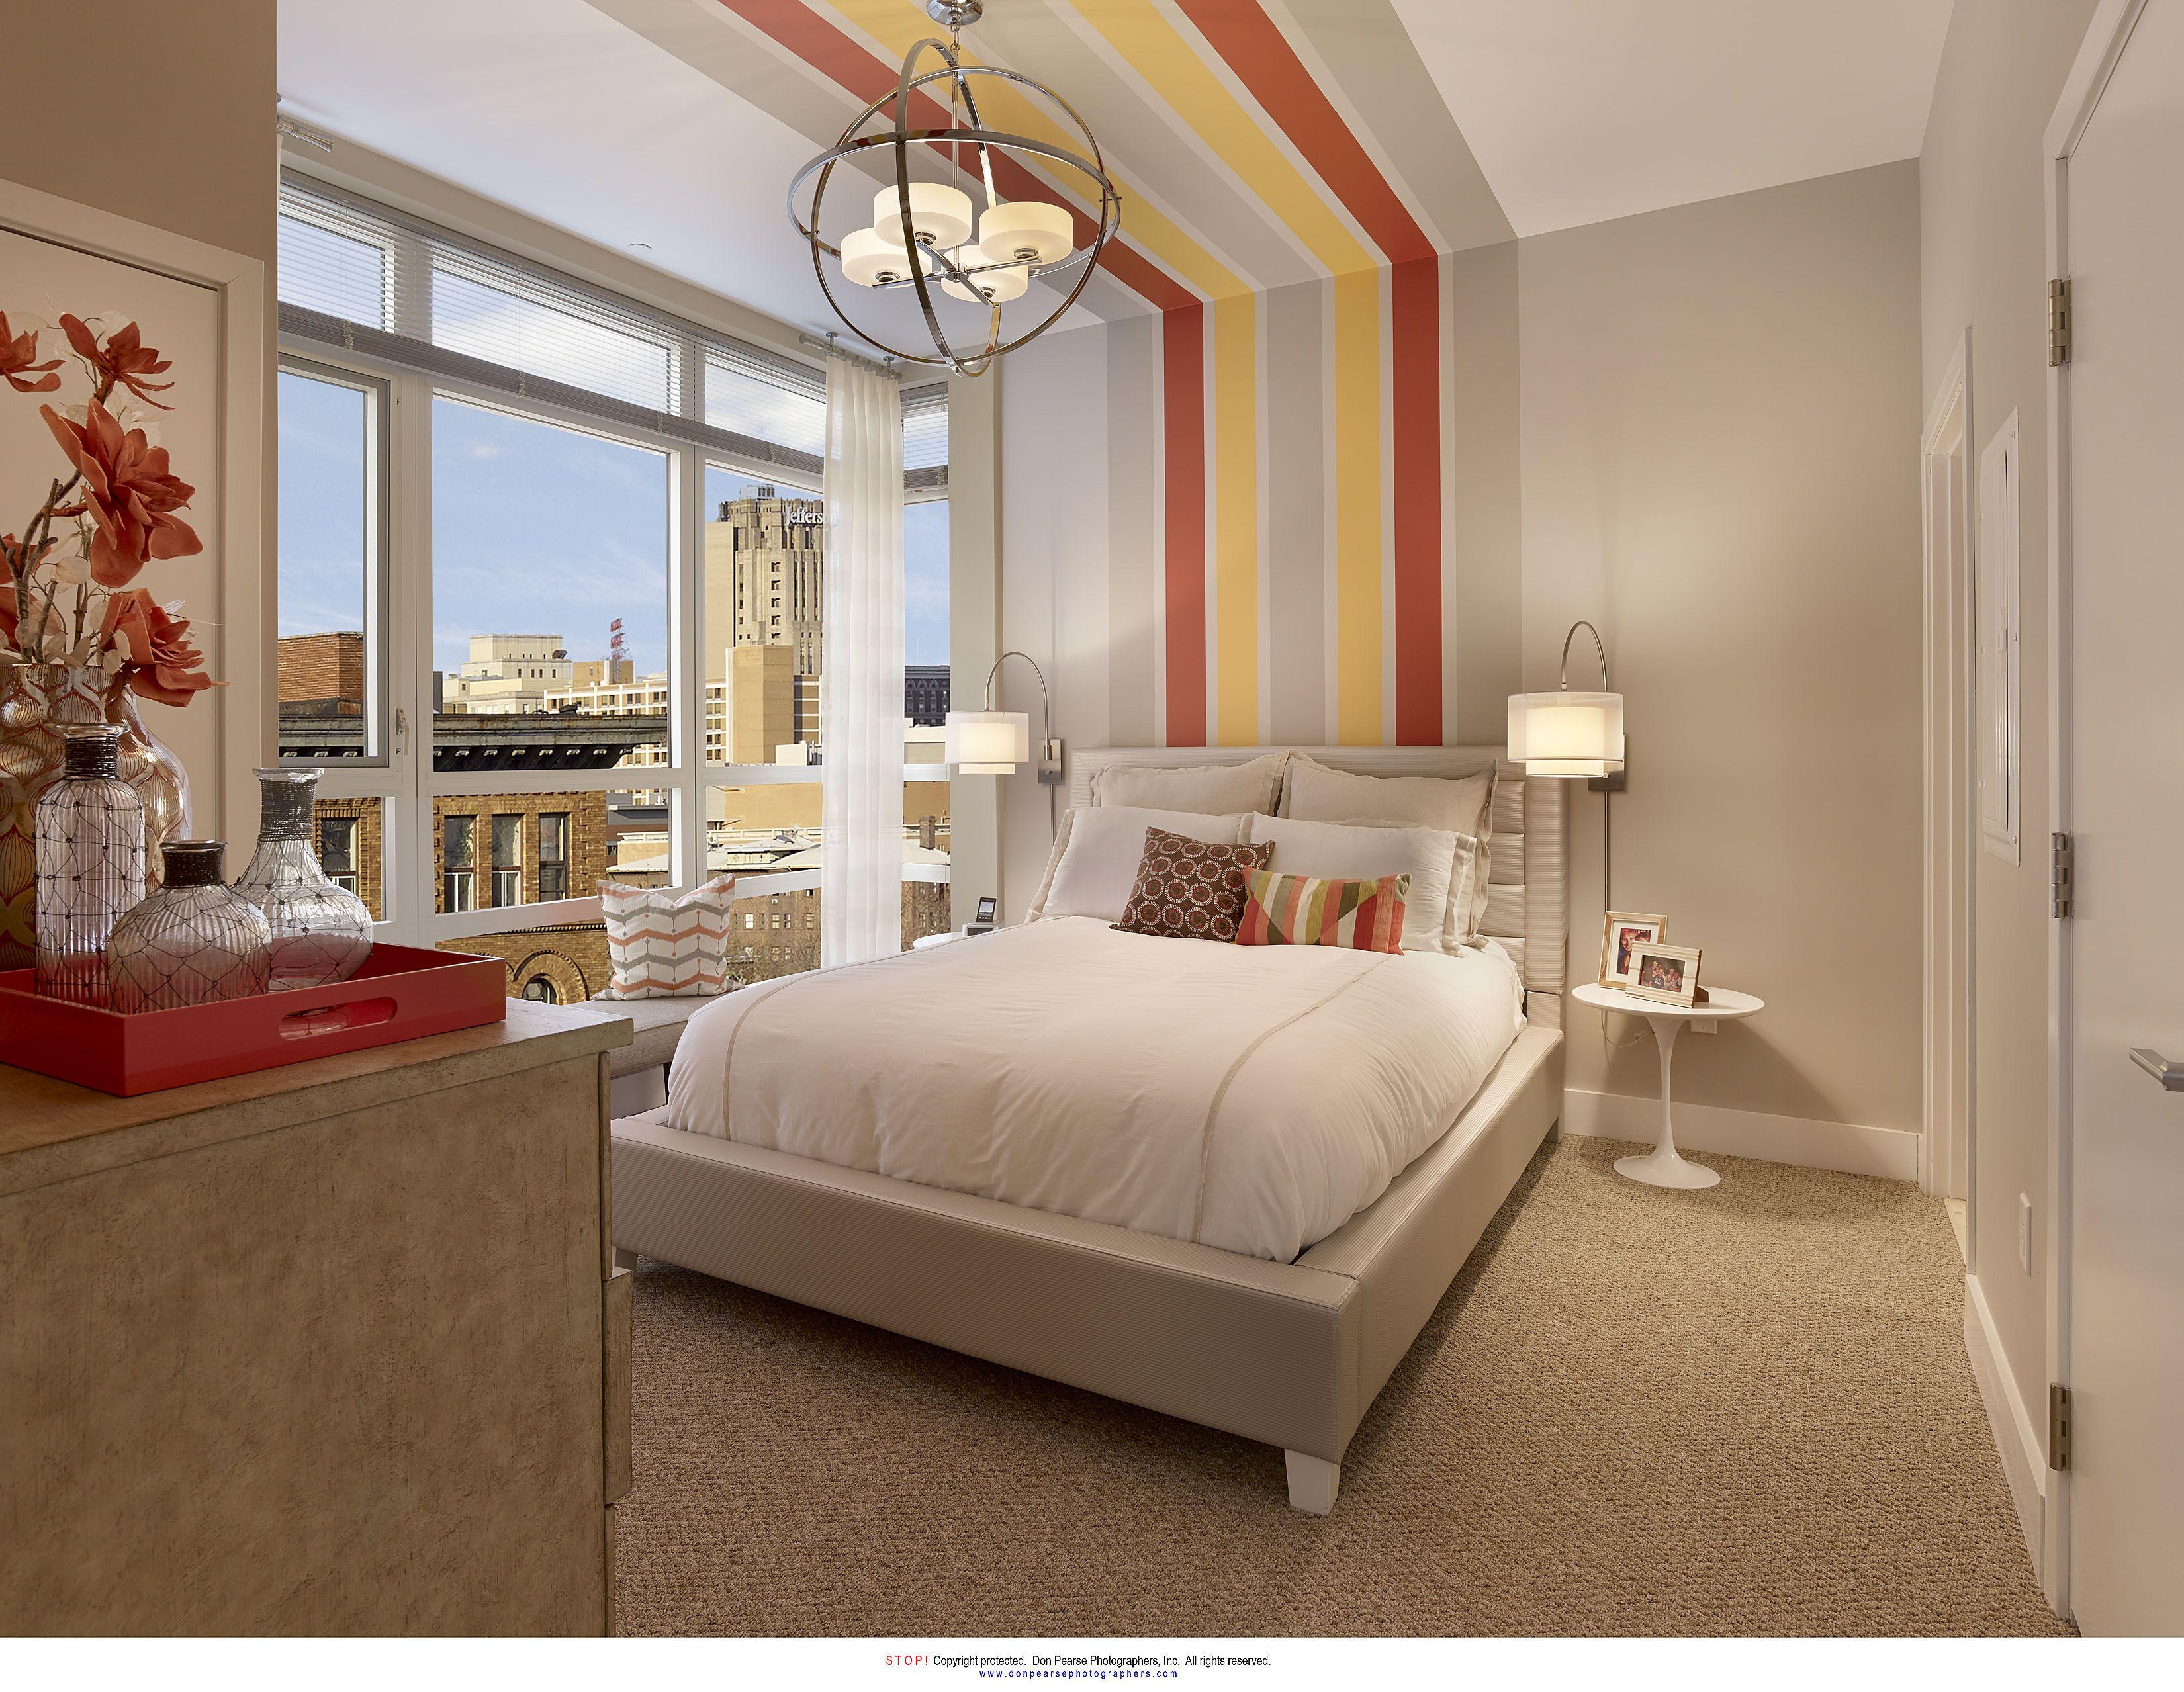 Southstar Lofts Luxury Apartments Philadelphia Apartment Luxury Apartments Apartment